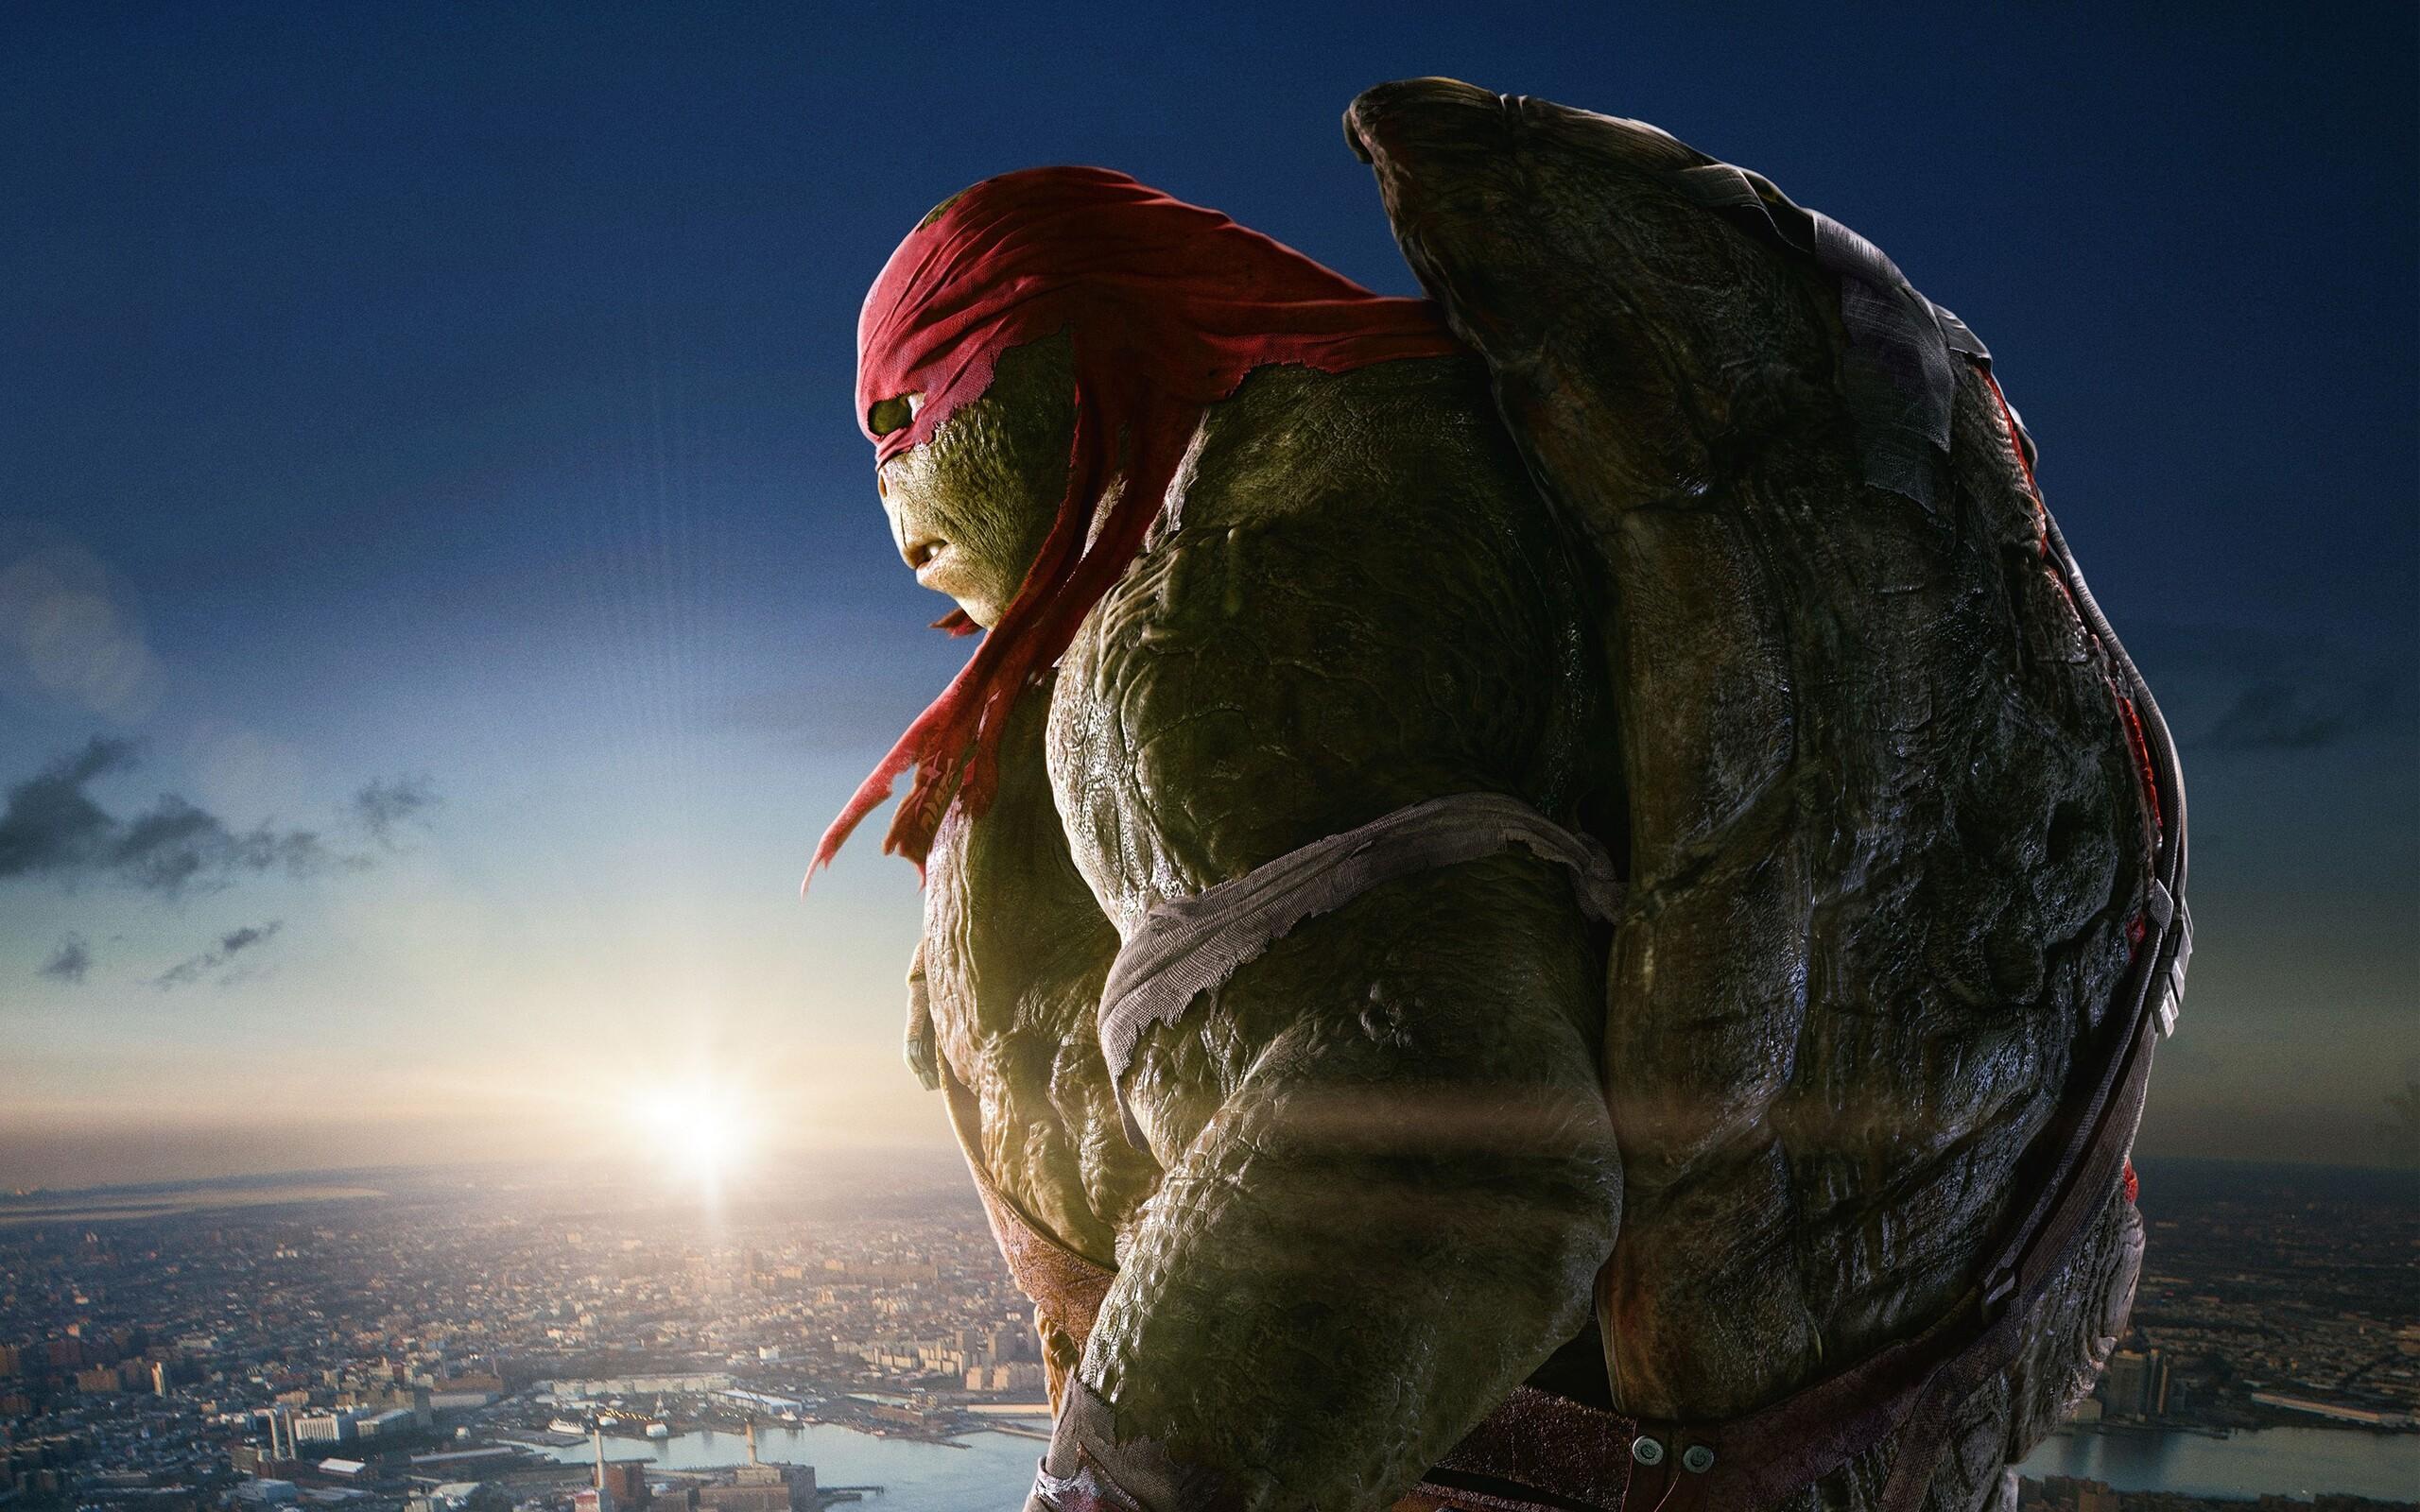 2560x1600 Raphael In Teenage Mutant Ninja Turtles 2560x1600